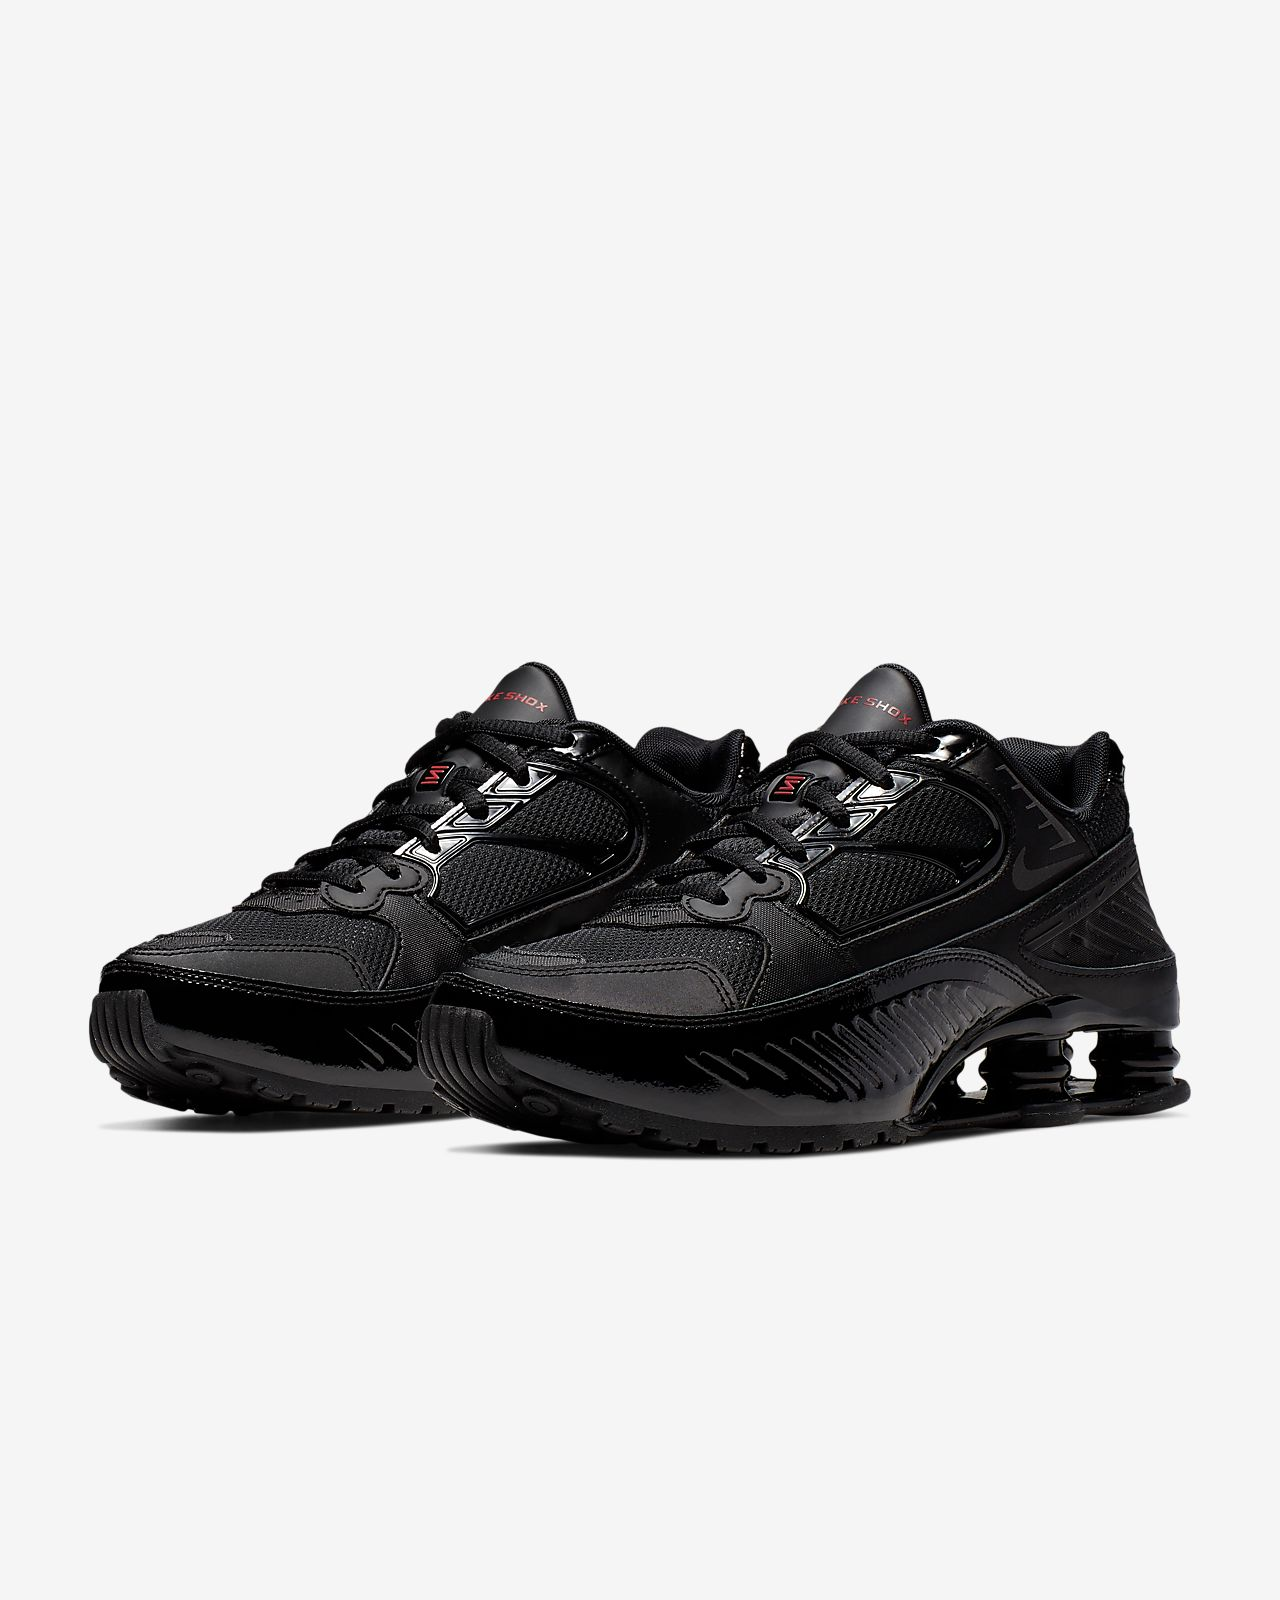 Nike Shox Enigma 9000 Sneakers BlackBlackGym Red Black